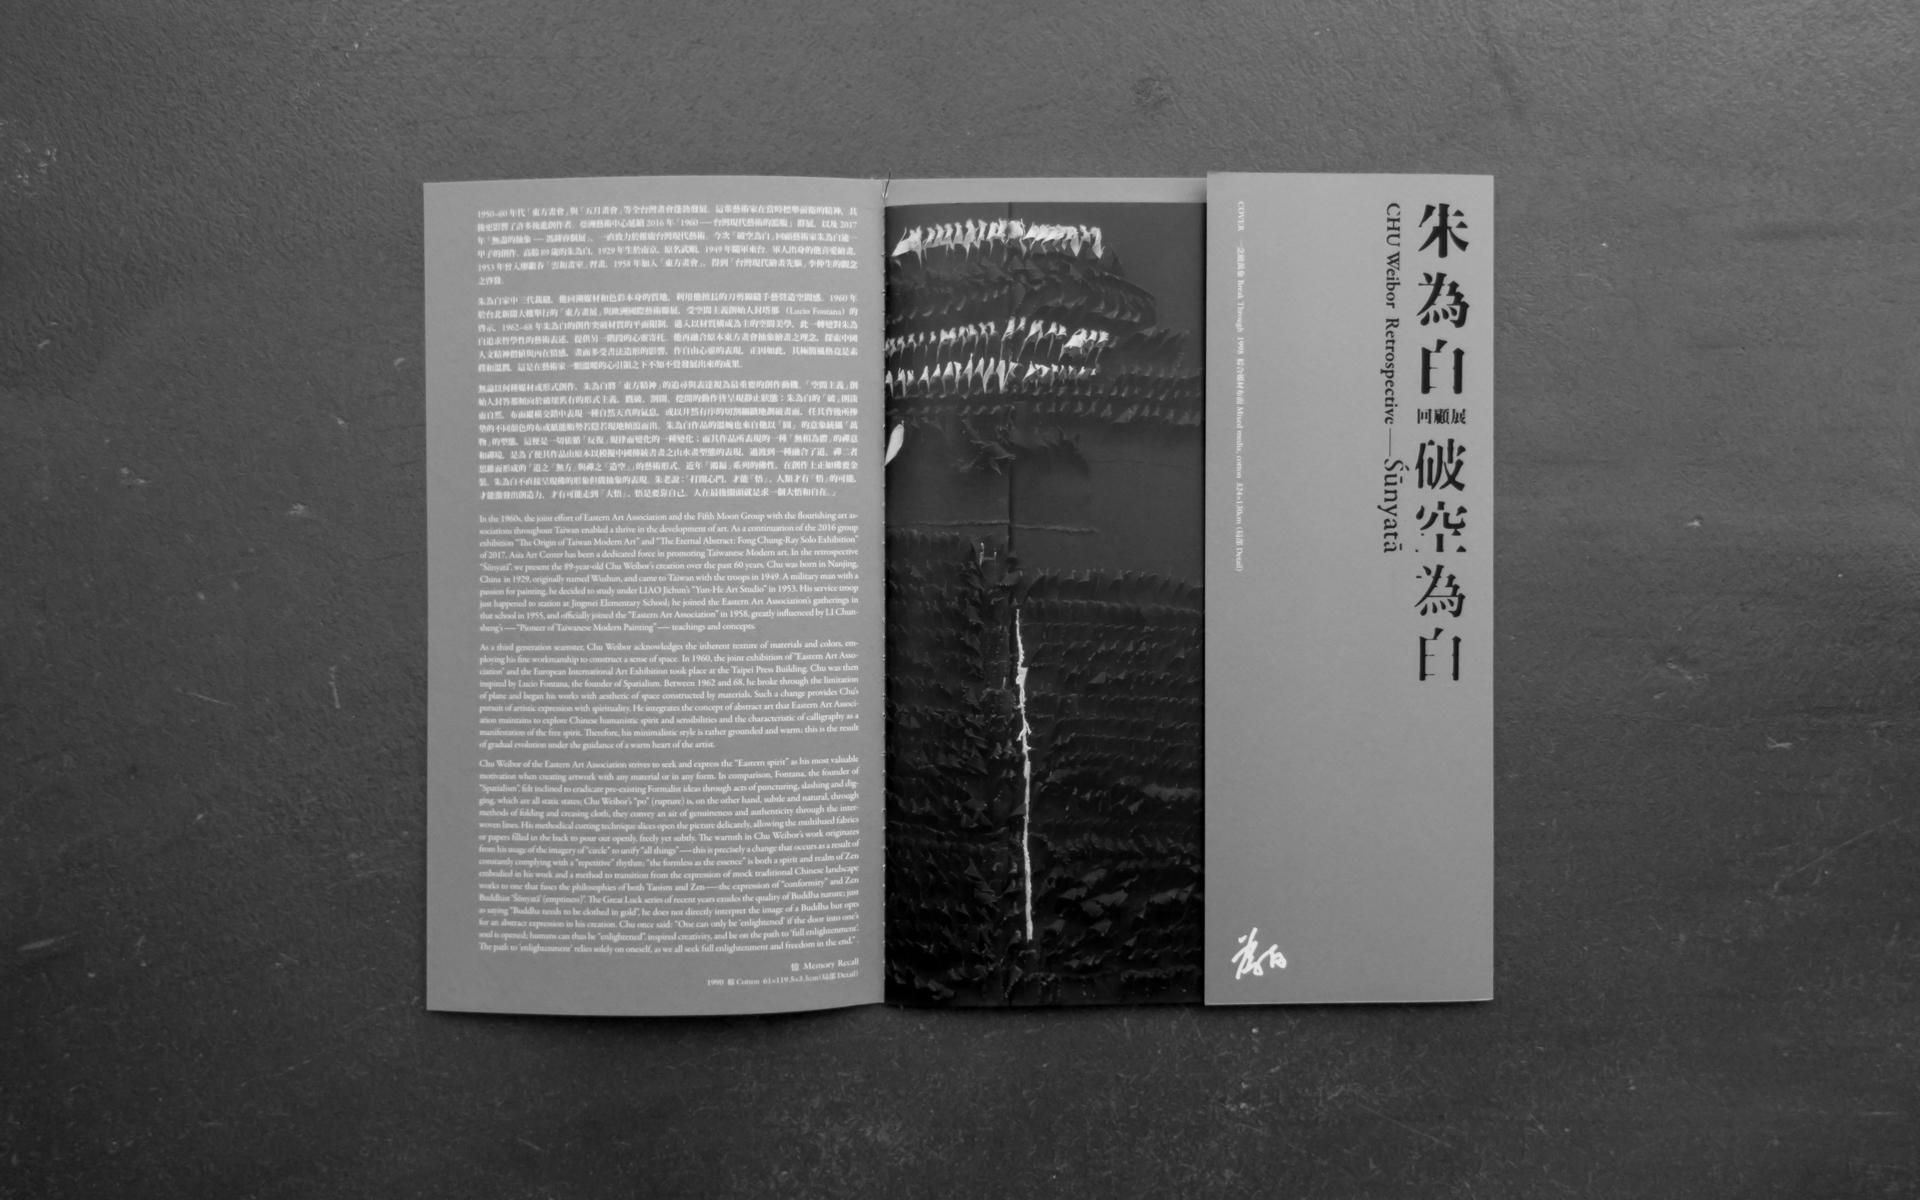 CHU Weibor Retrosprctive: Śūnyatā by Sung, Di-Yen - Creative Work - $i